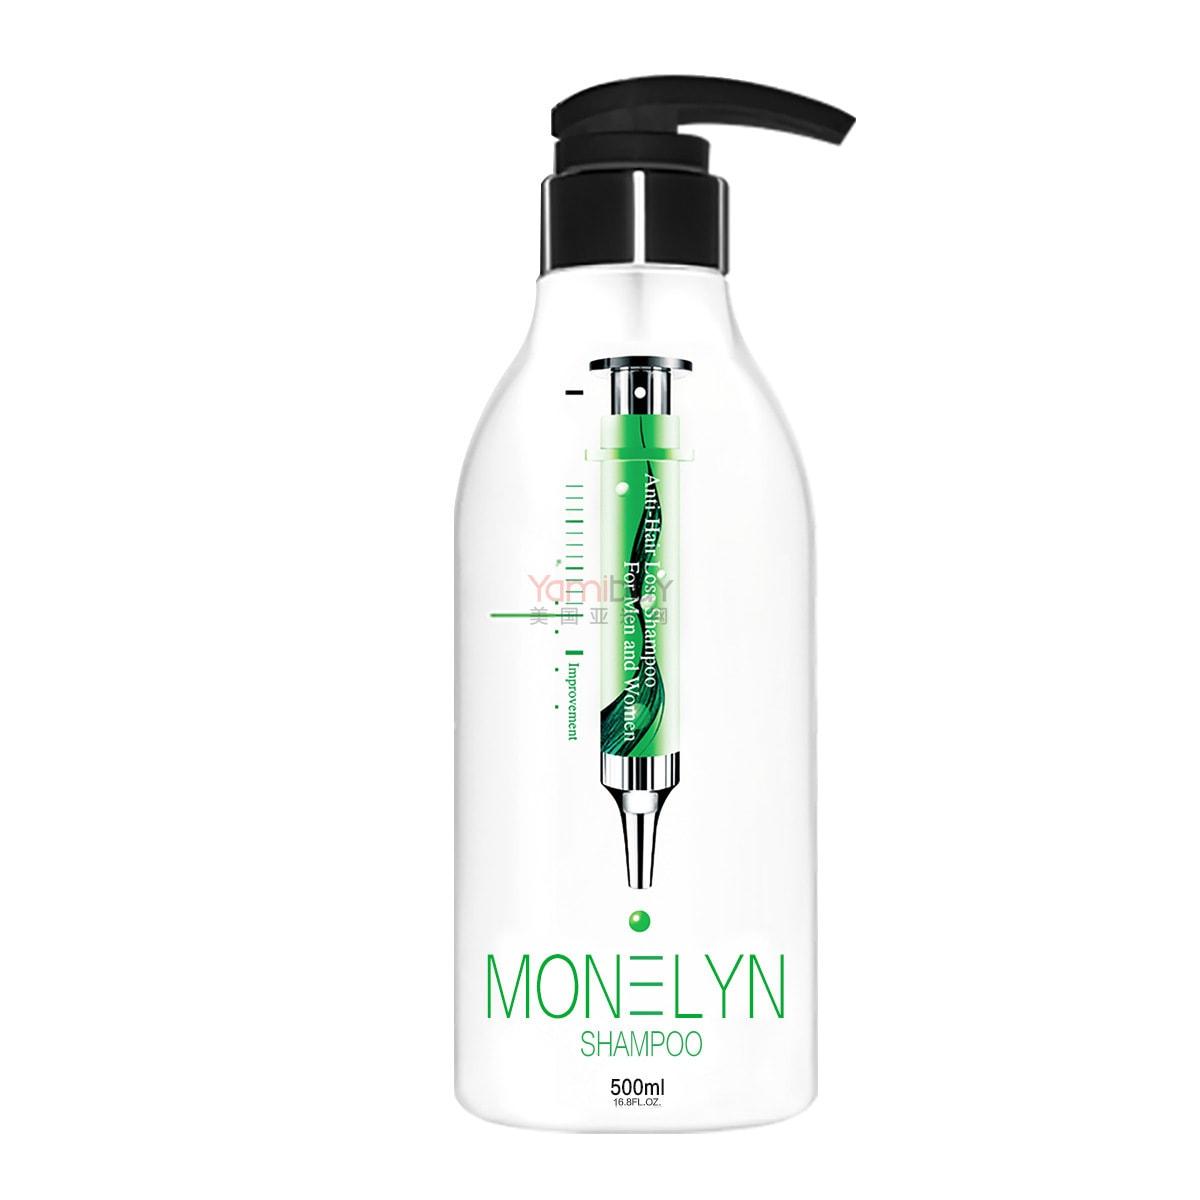 DONGSUNG PHARM MONELYN Shampoo 500ml